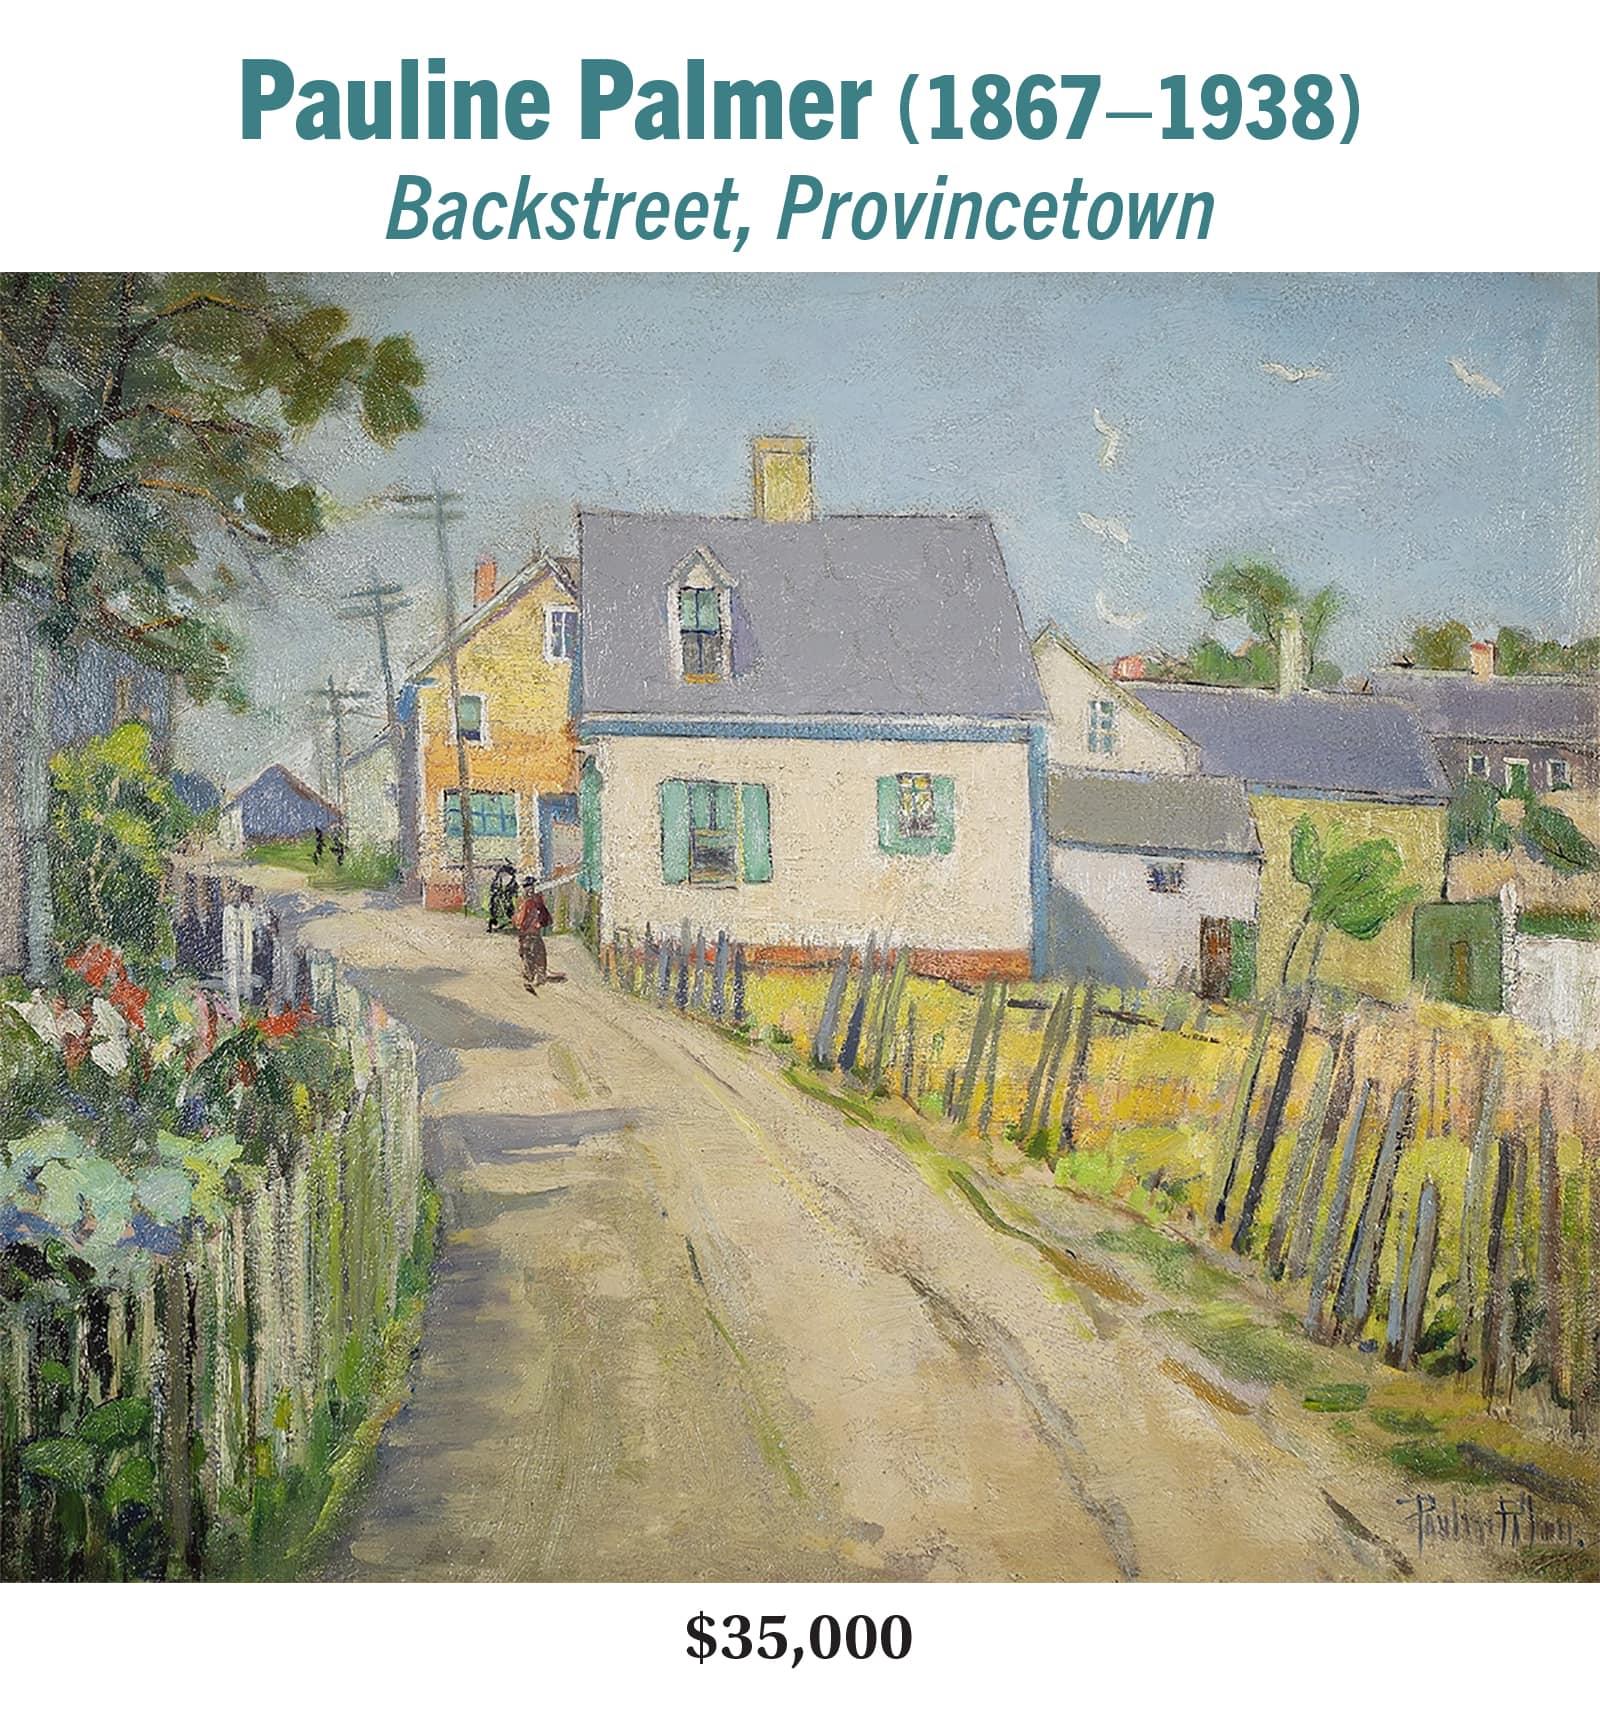 Pauline Palmer (1867–1938), Backstreet, Provincetown, oil on board, American impressionist landscape painting